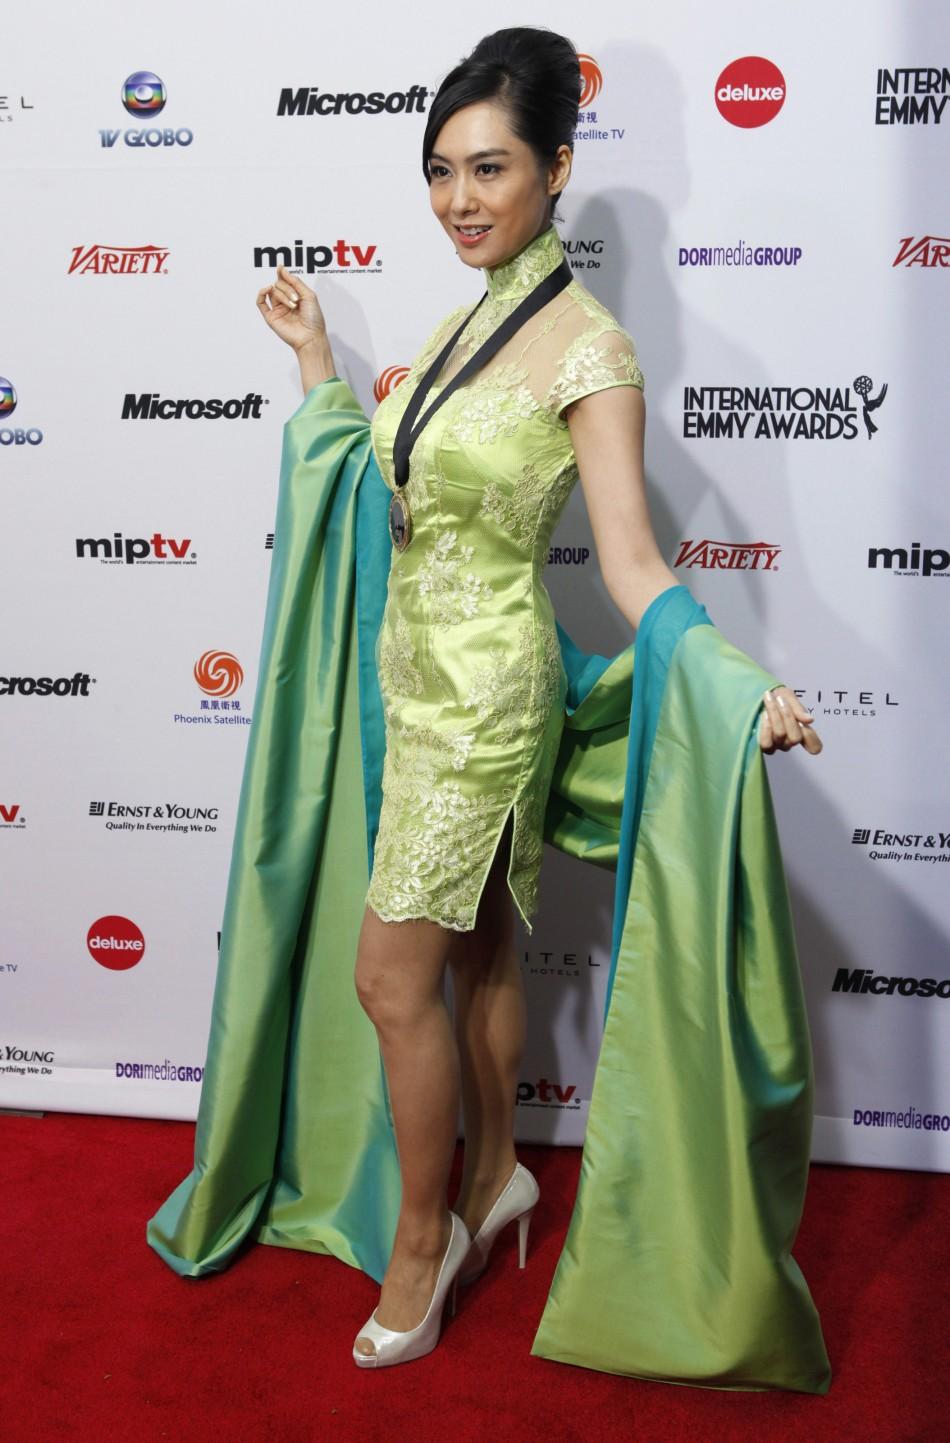 Actress Athena Chu Yan of China arrives at the International Emmy Awards